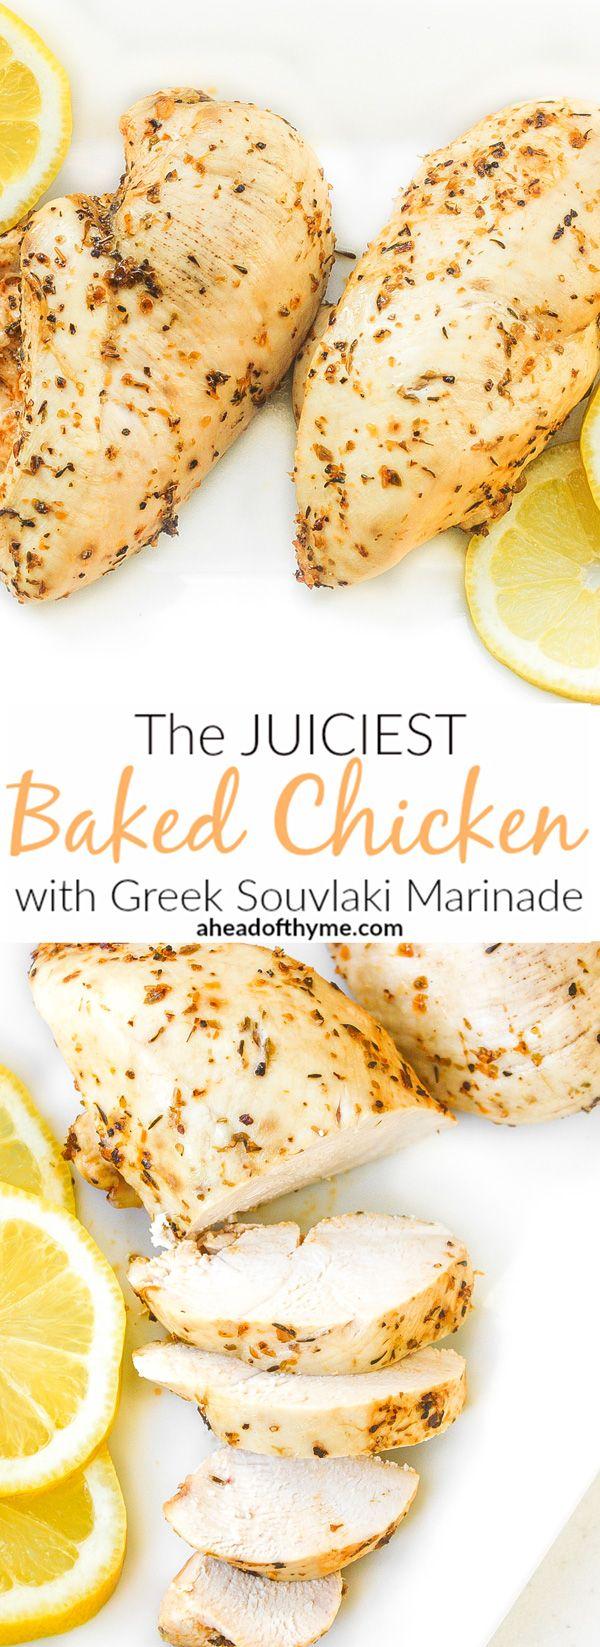 The Juiciest Baked Chicken Breast with Greek Souvlaki Marinade ...